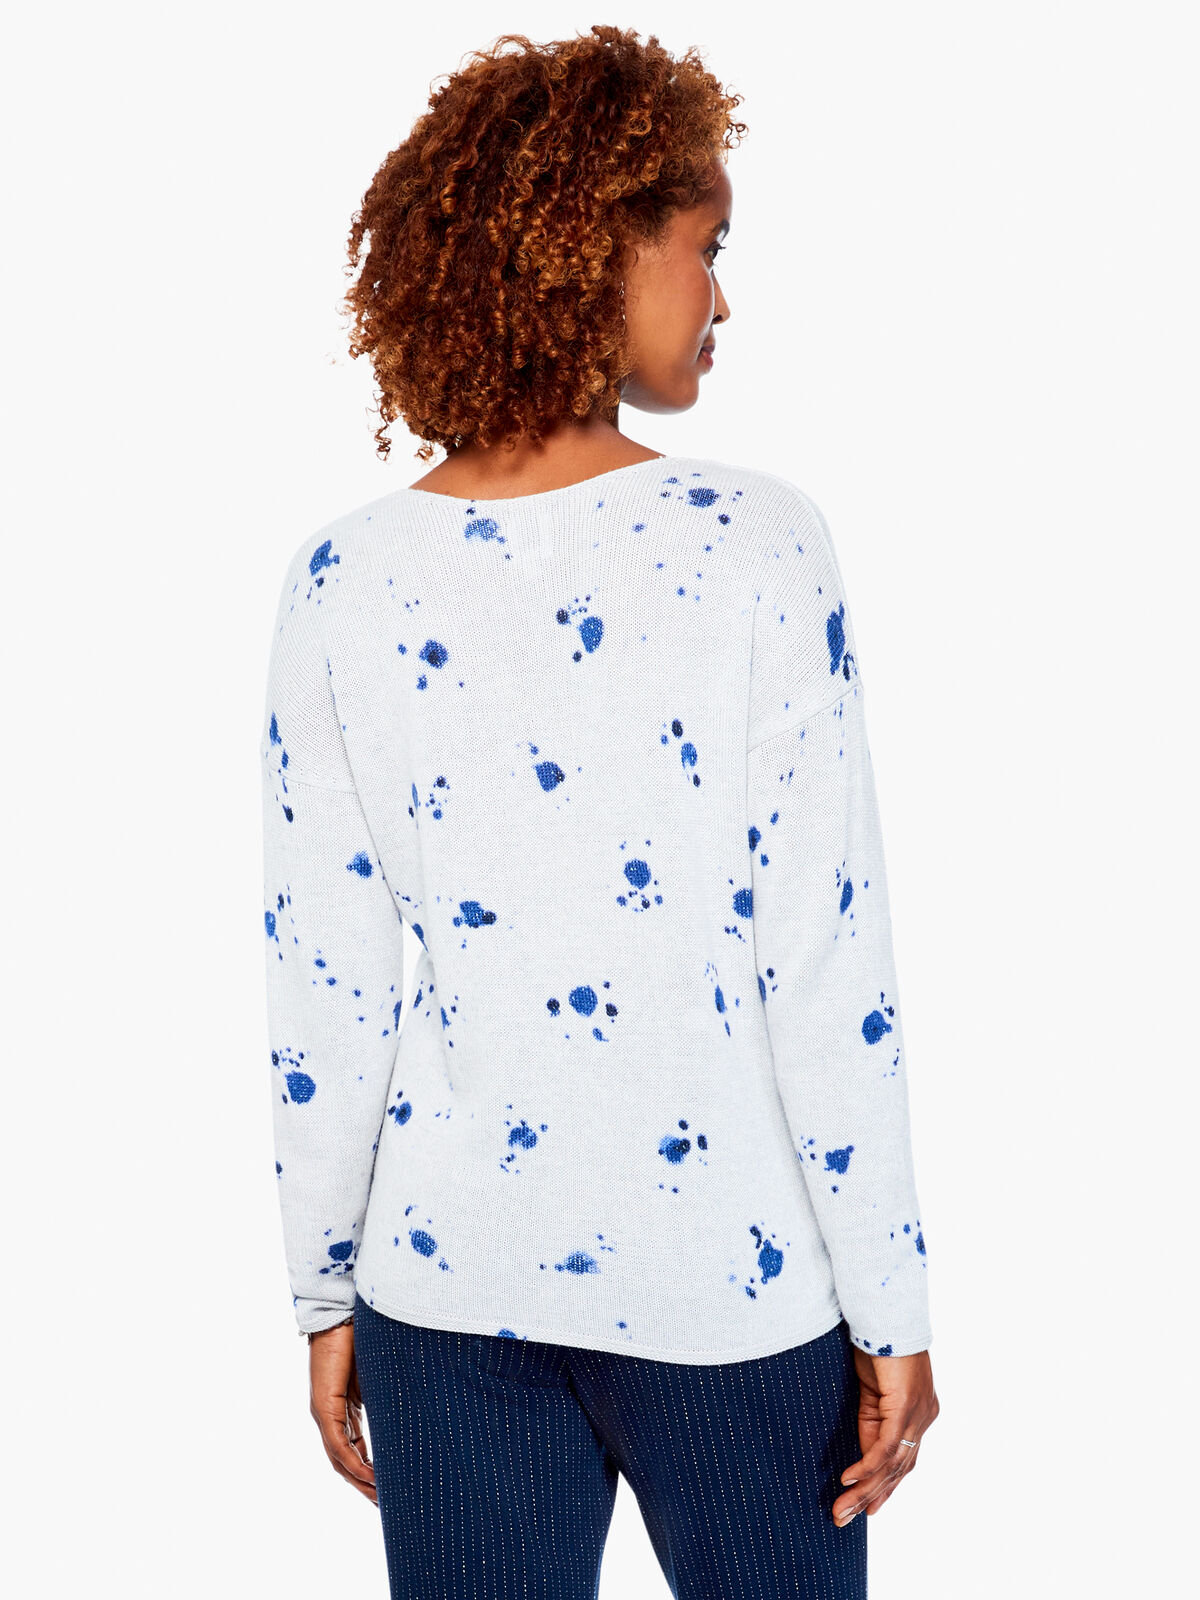 Shibori Stamp Sweater